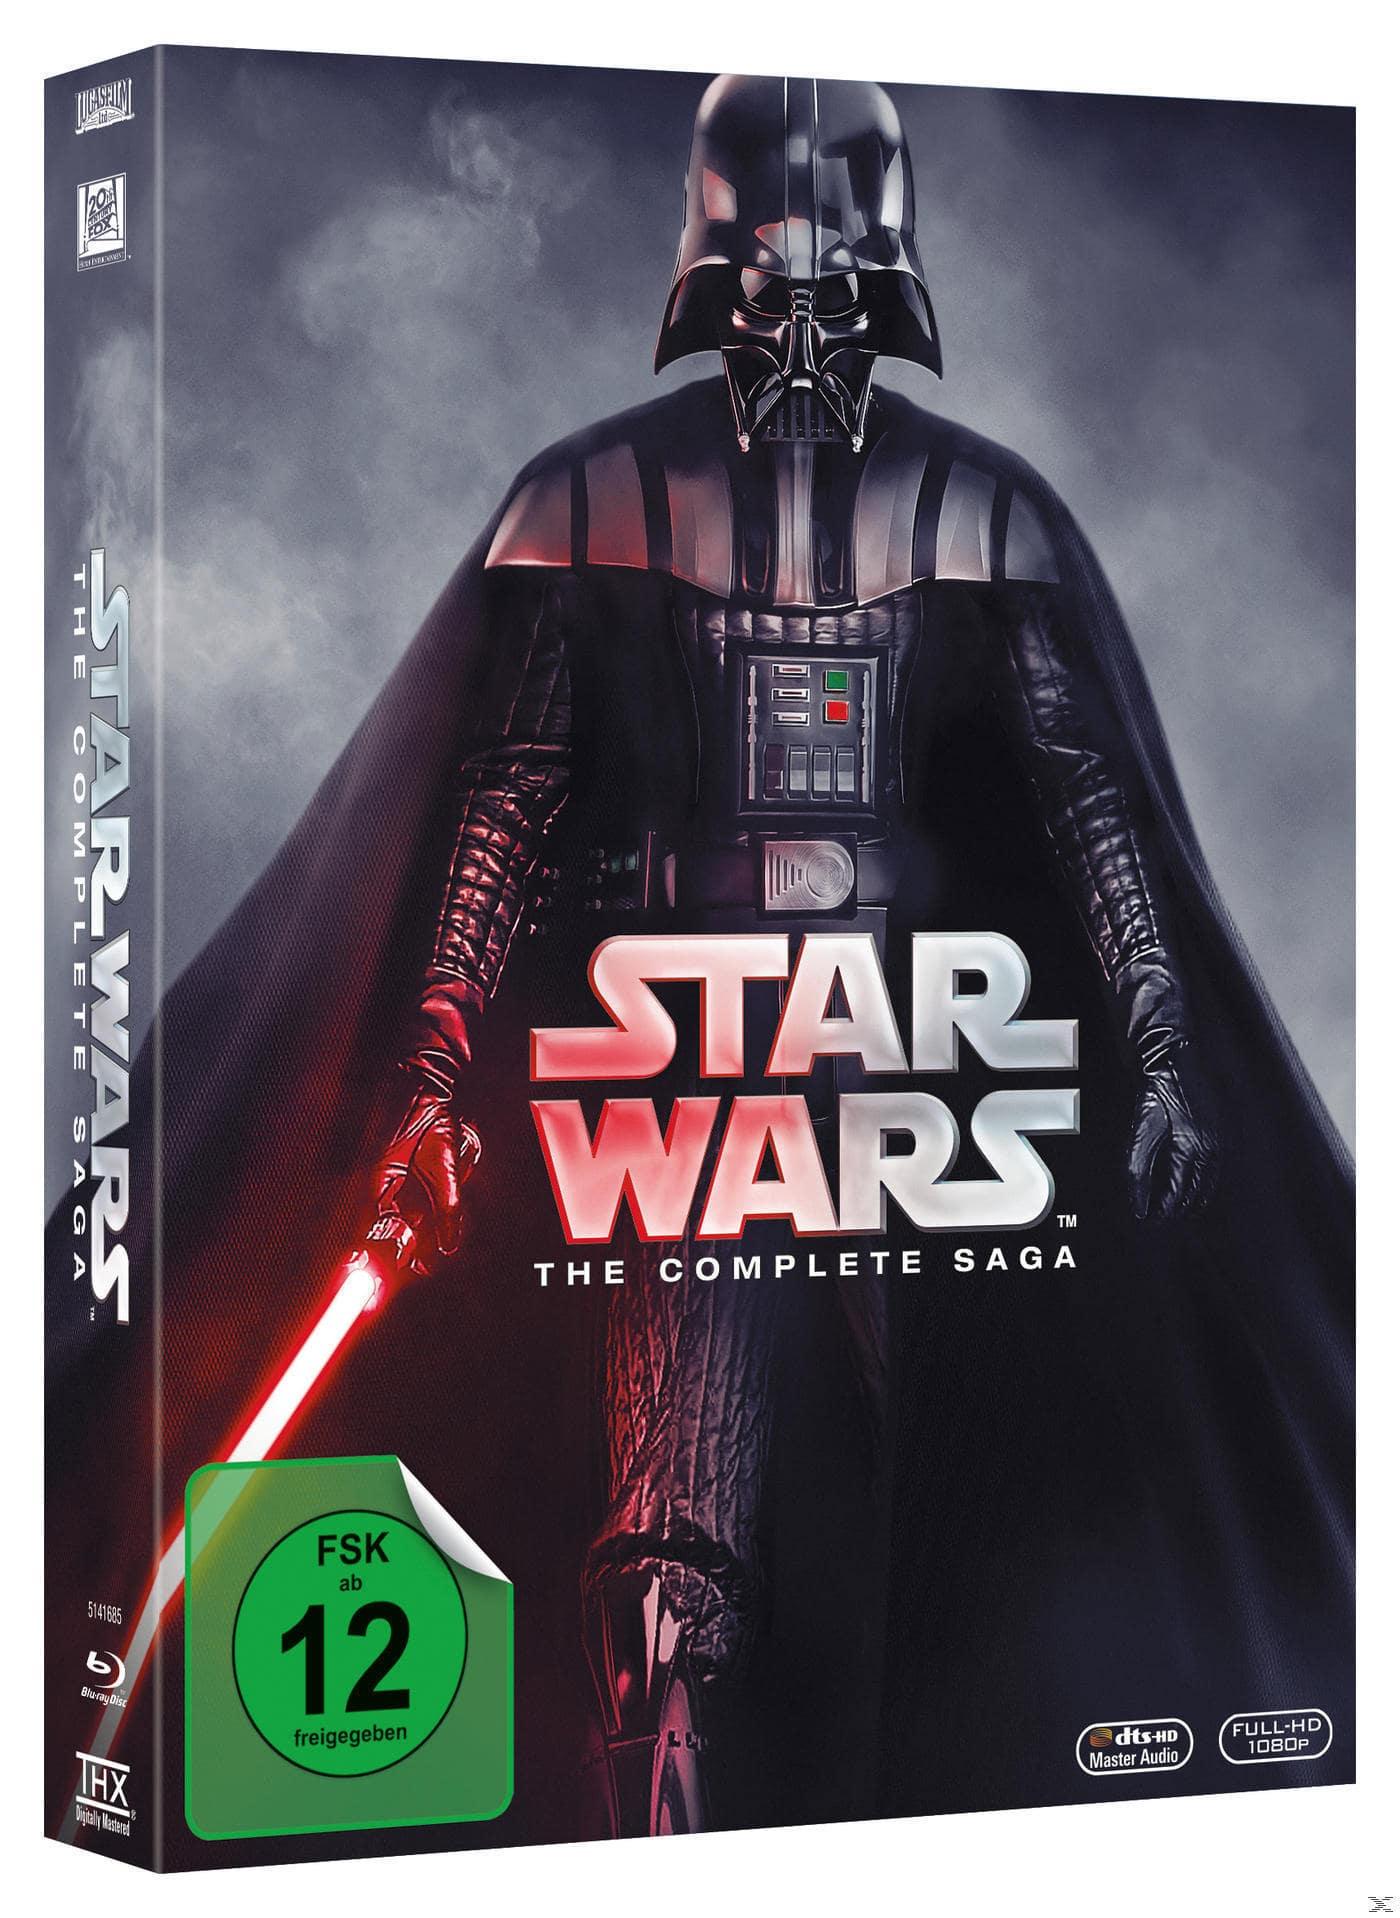 Star Wars - The Complete Saga I-VI BLU-RAY Box (BLU-RAY) für 89,99 Euro